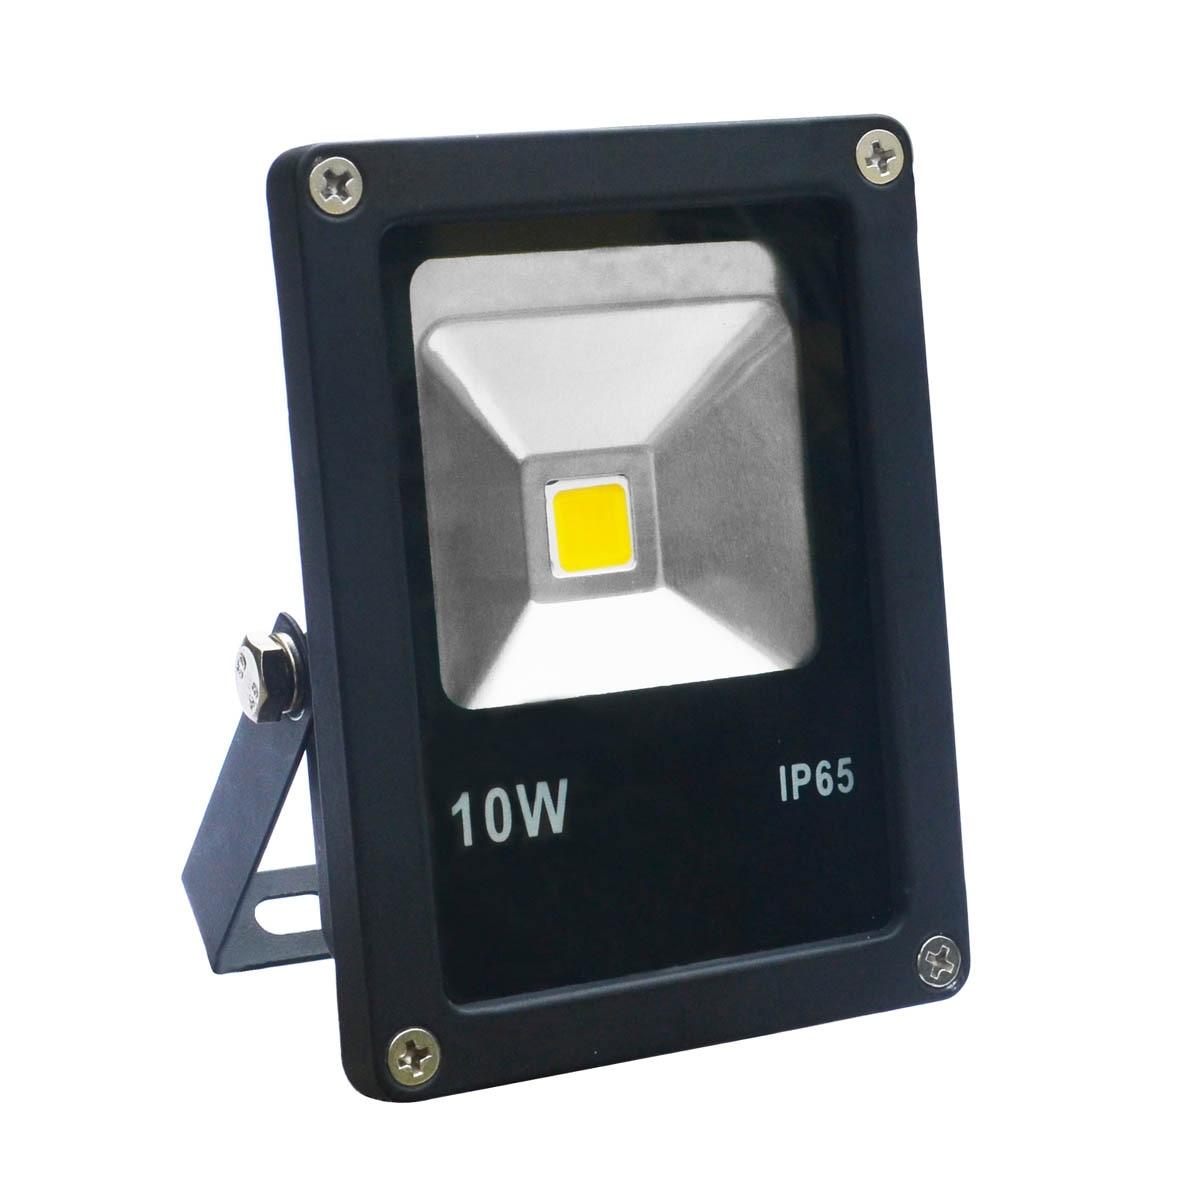 Jiawen 5st / lot 10W Cool White eller Warm White LED Flood Lights, Vattentät IP65 för utomhus (AC85-265V)